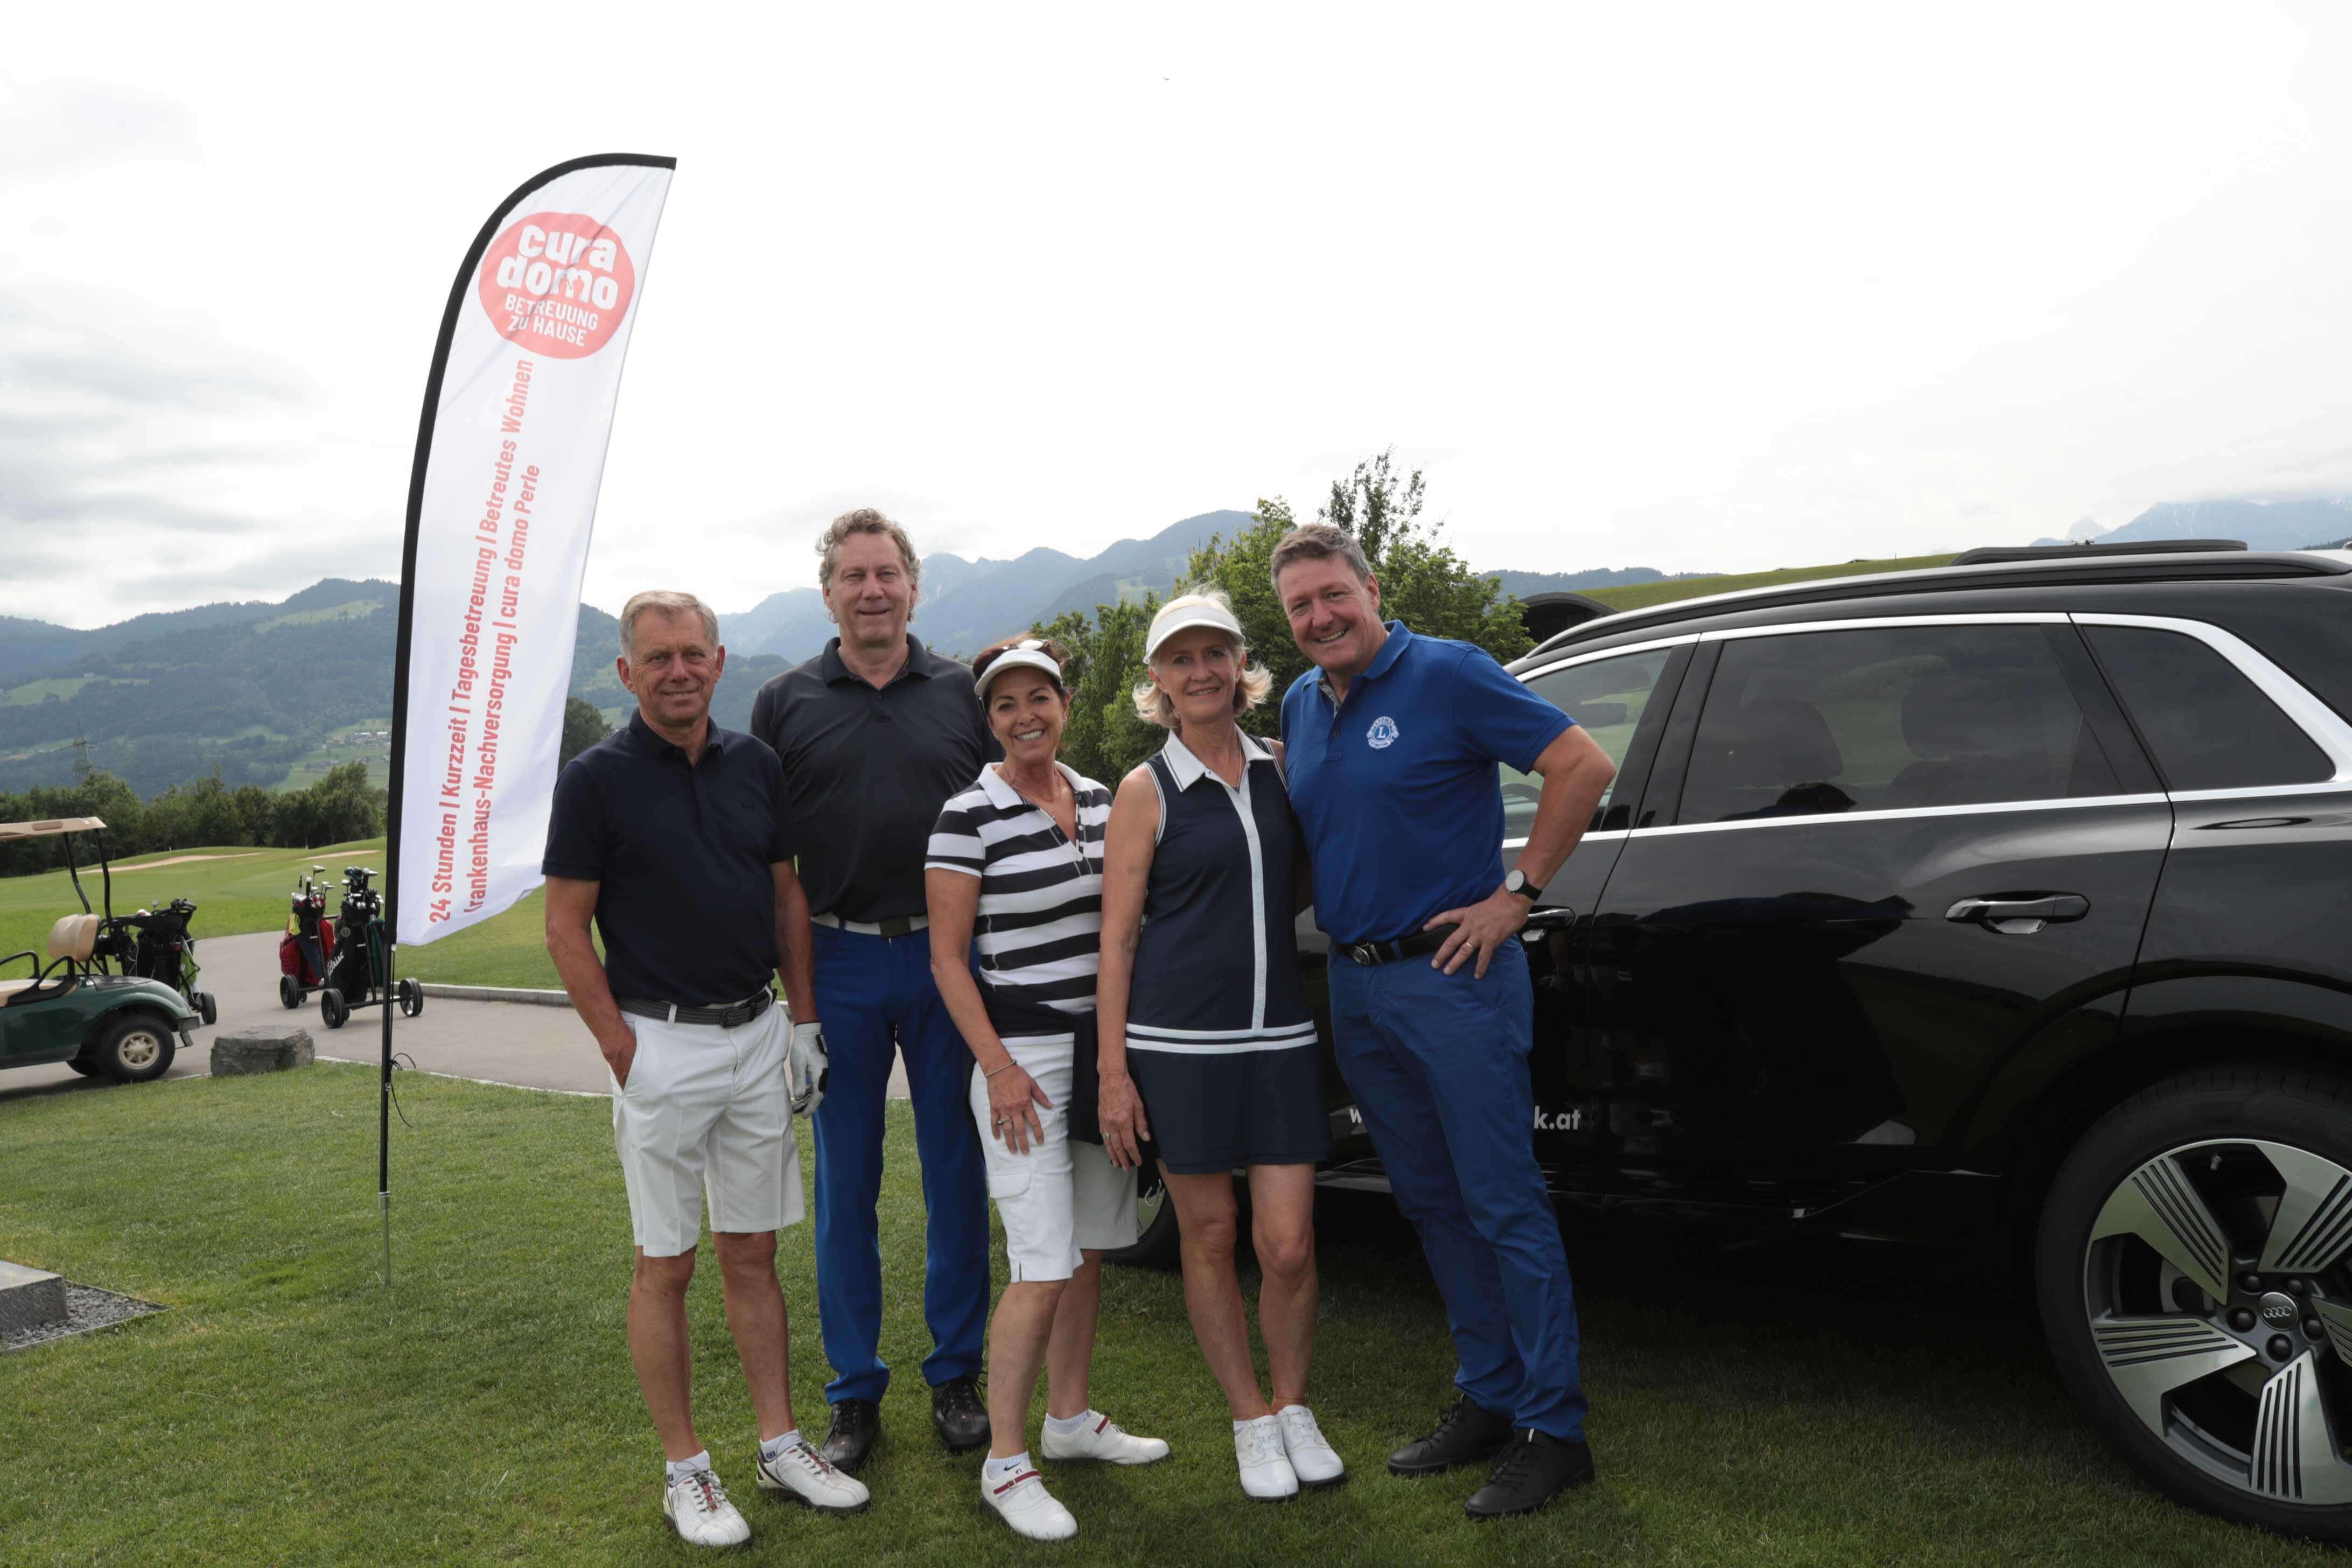 Charity-Golfturnier 2019 - Lionsclub Feldkirch Montfort